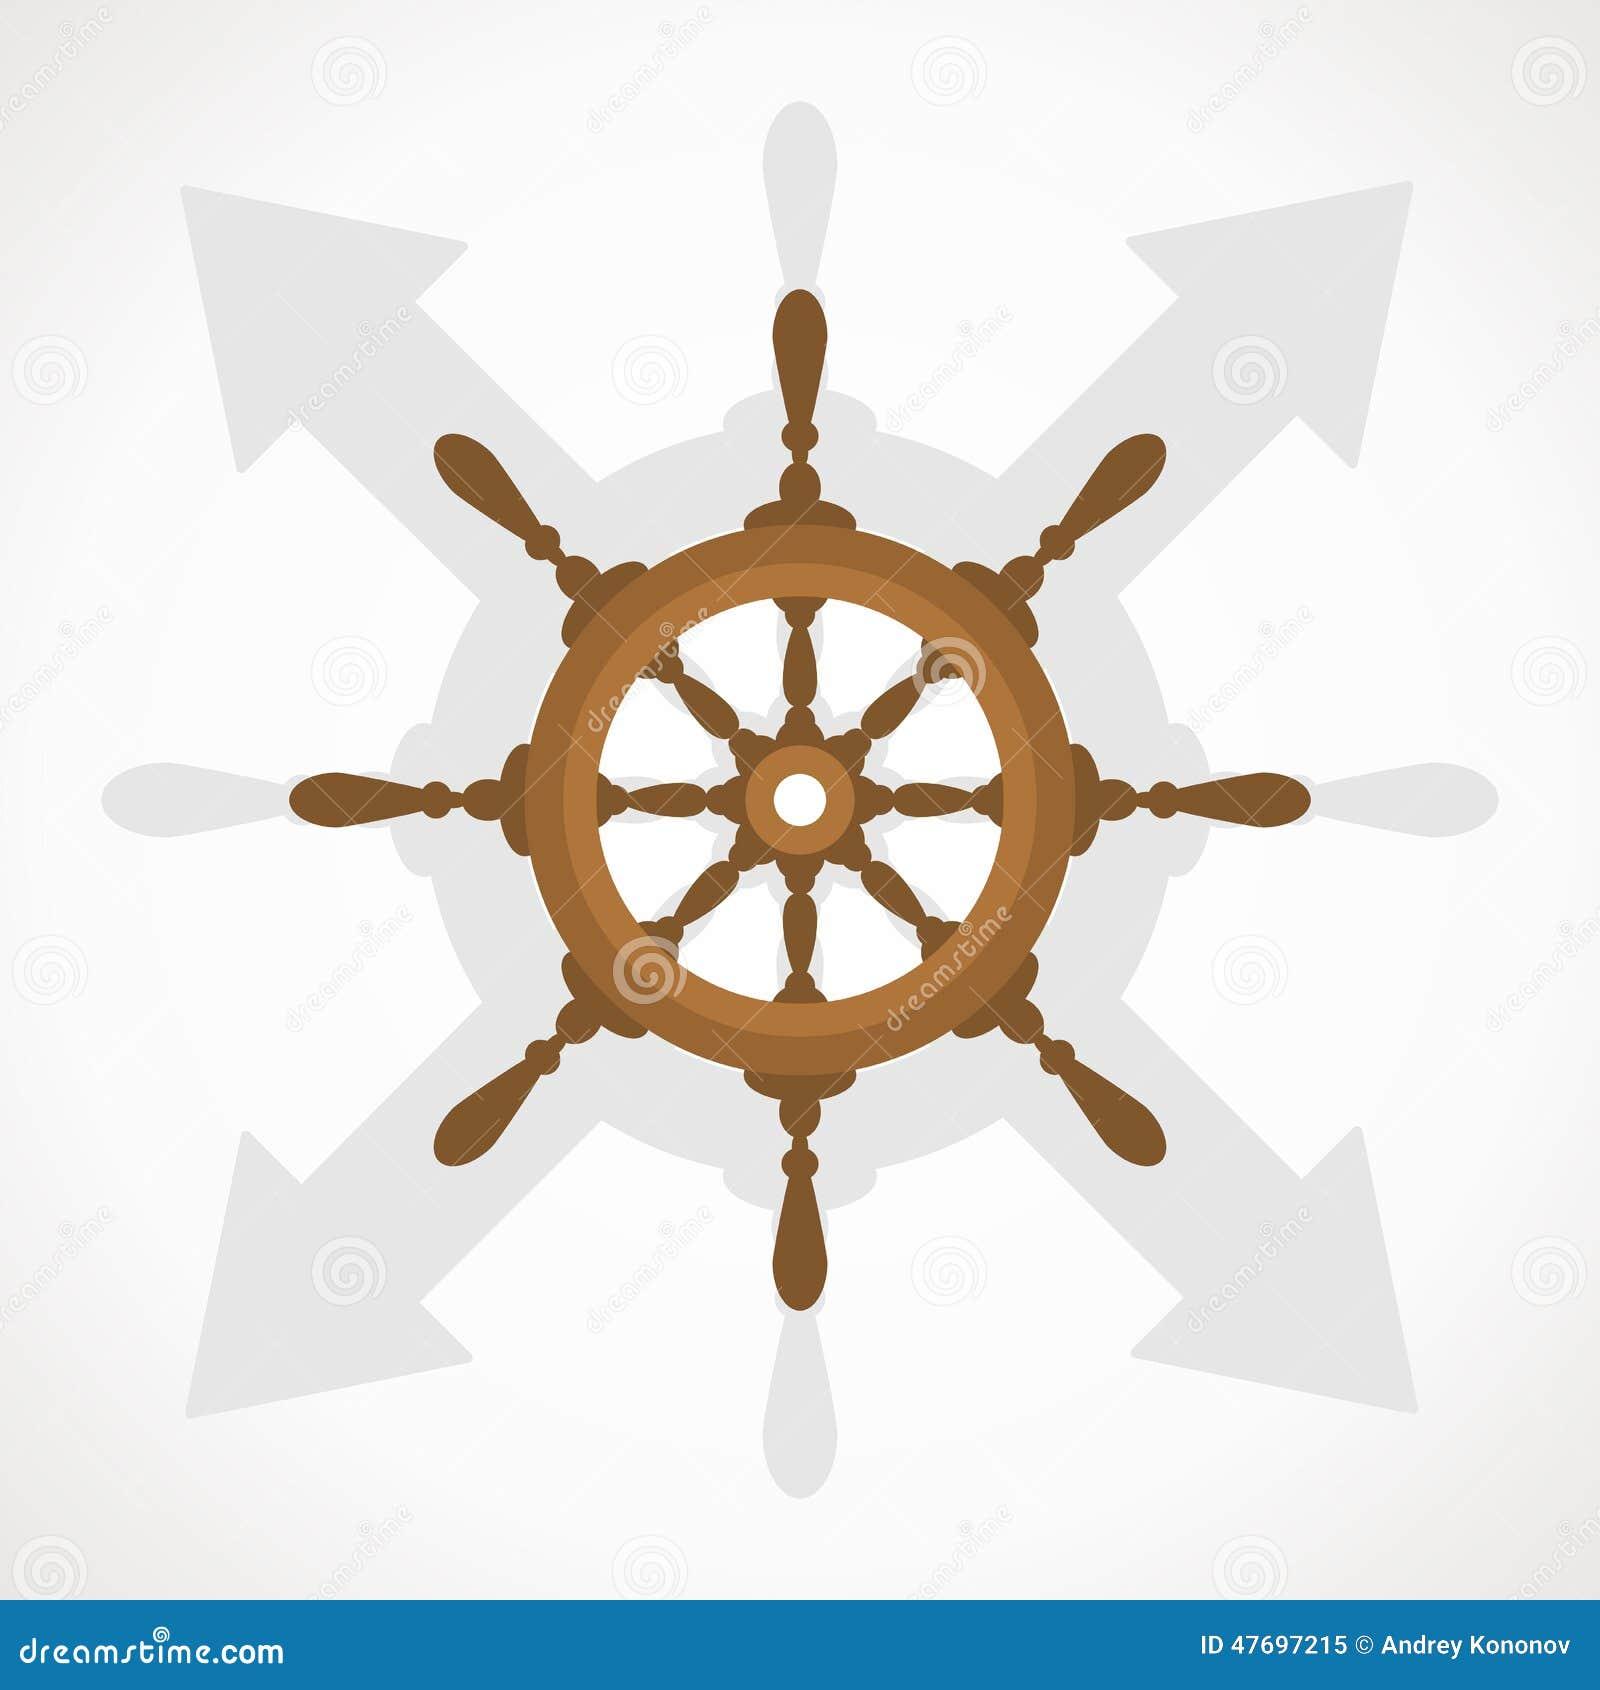 Interiortransportation de la direction wheel